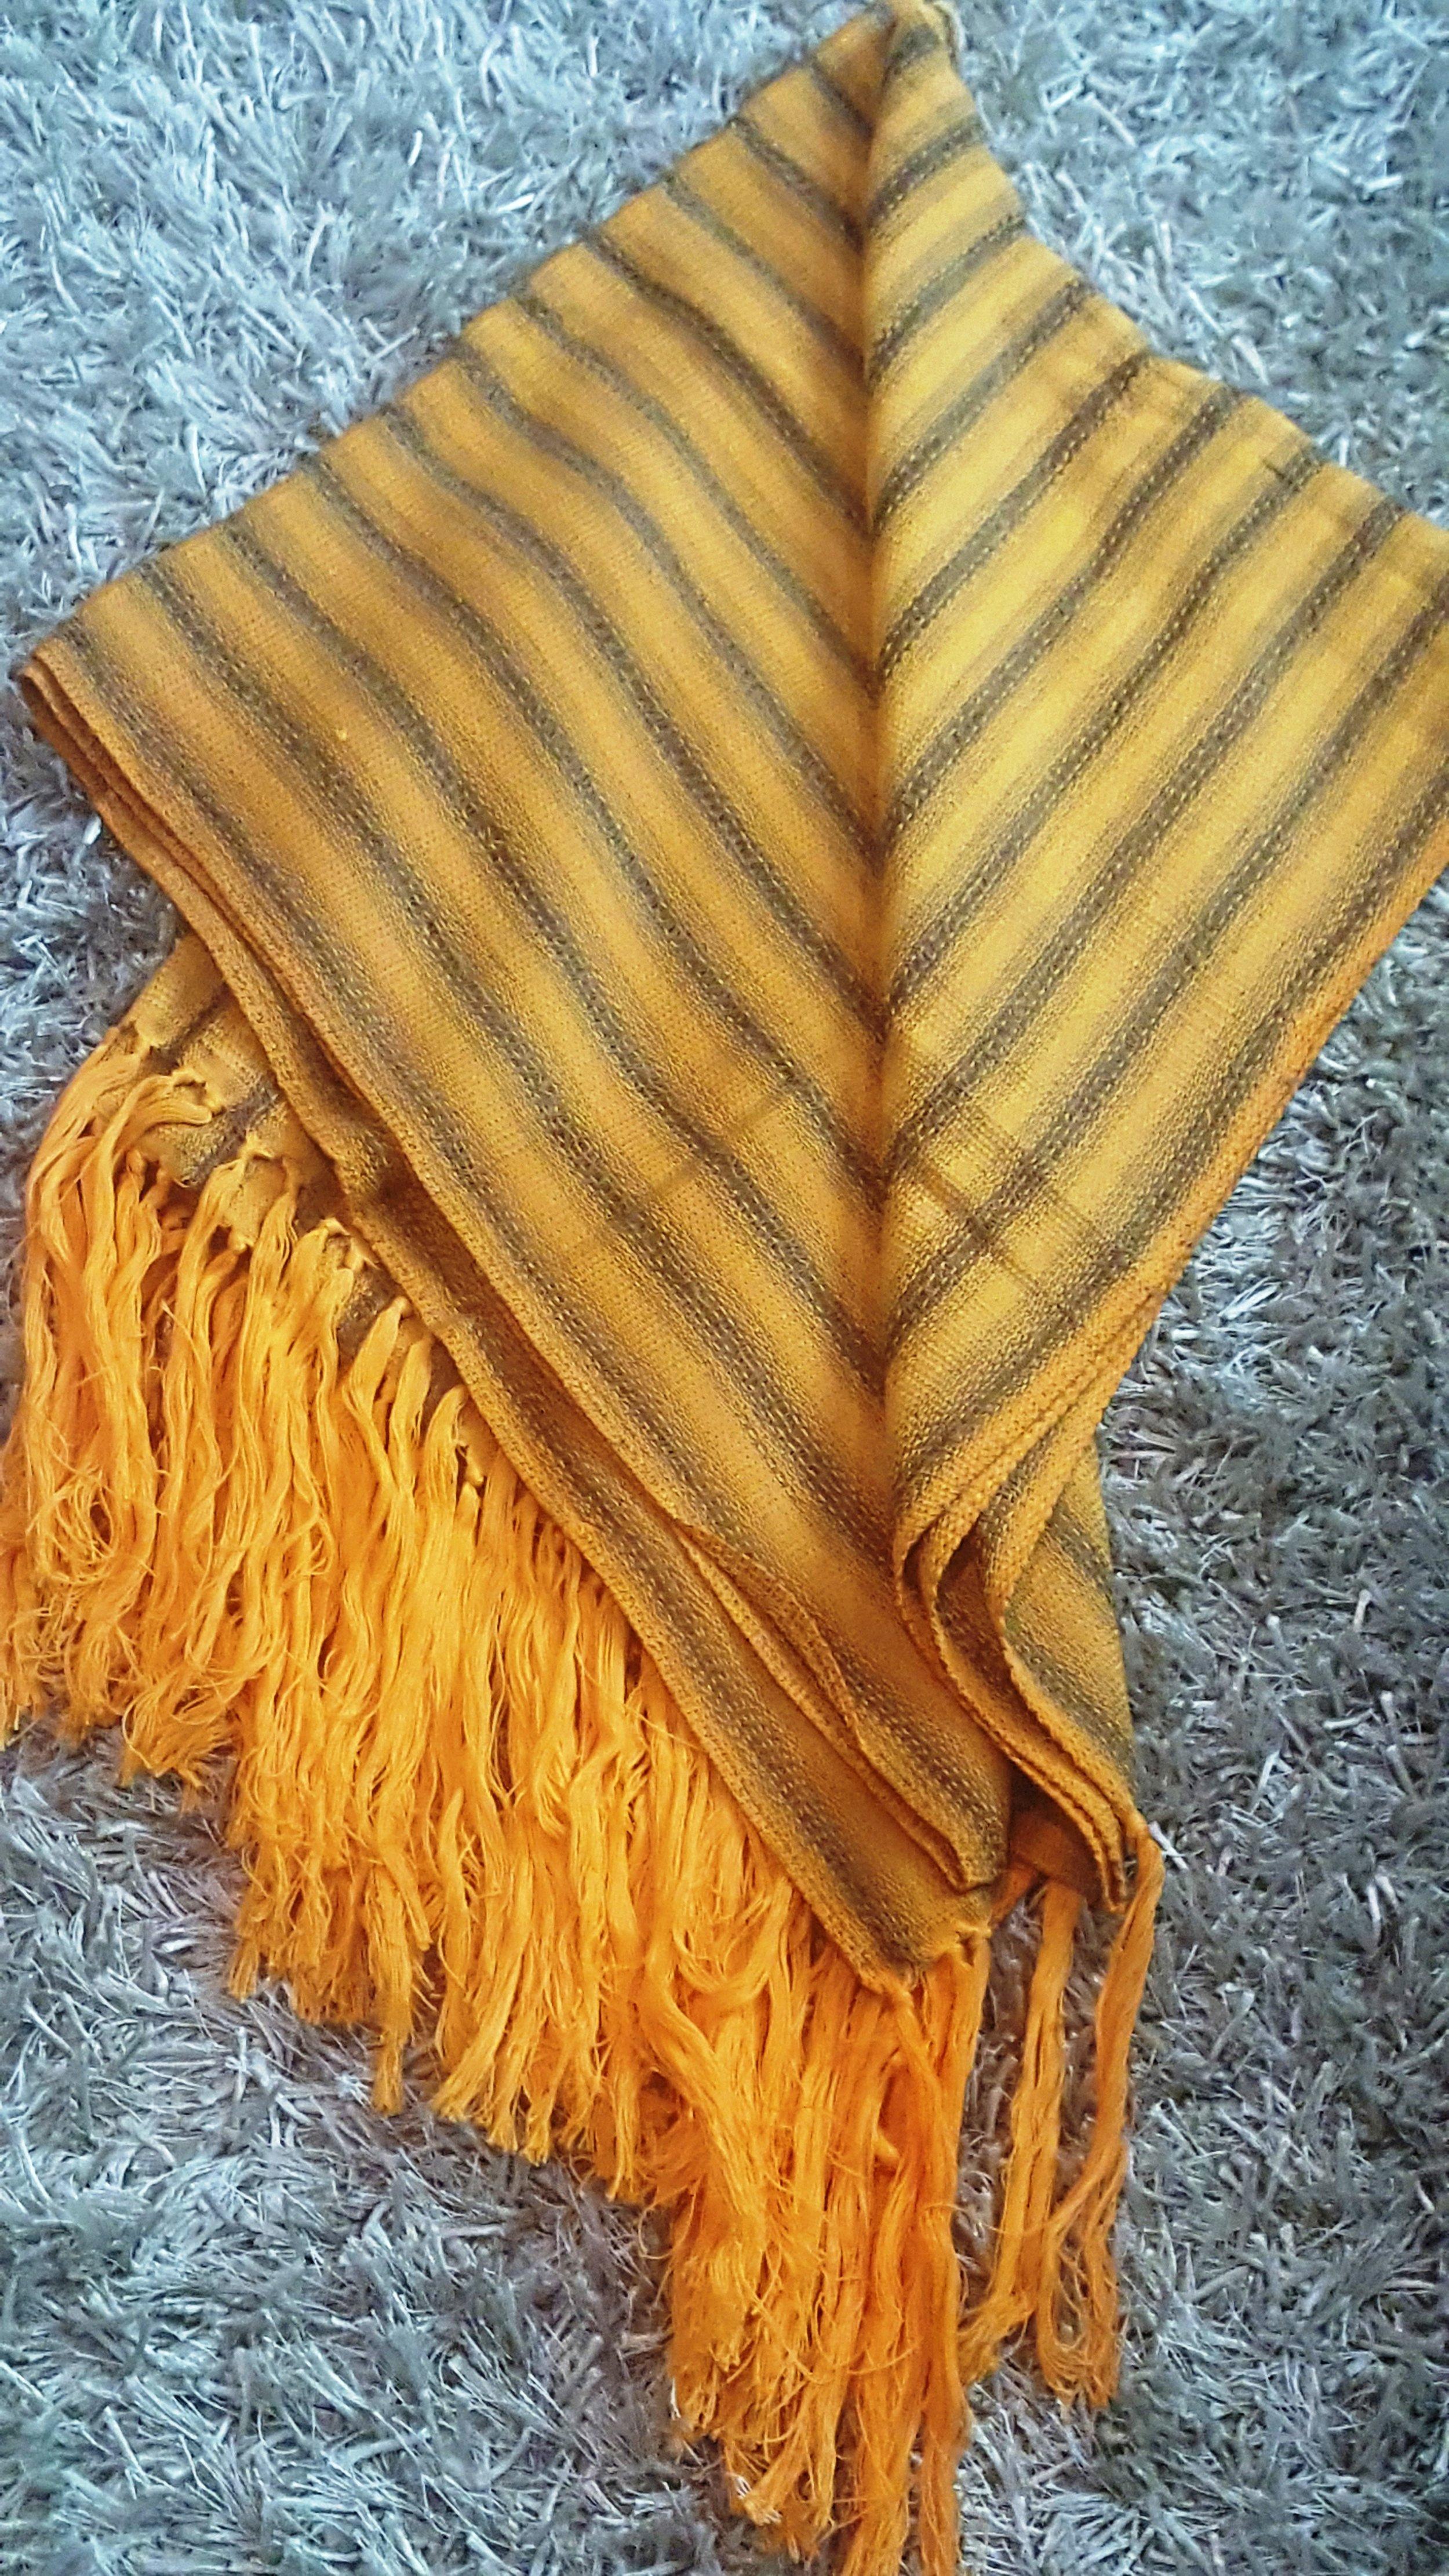 Etole, coton et viscose - Orange et taupe - 60 000 F CFA